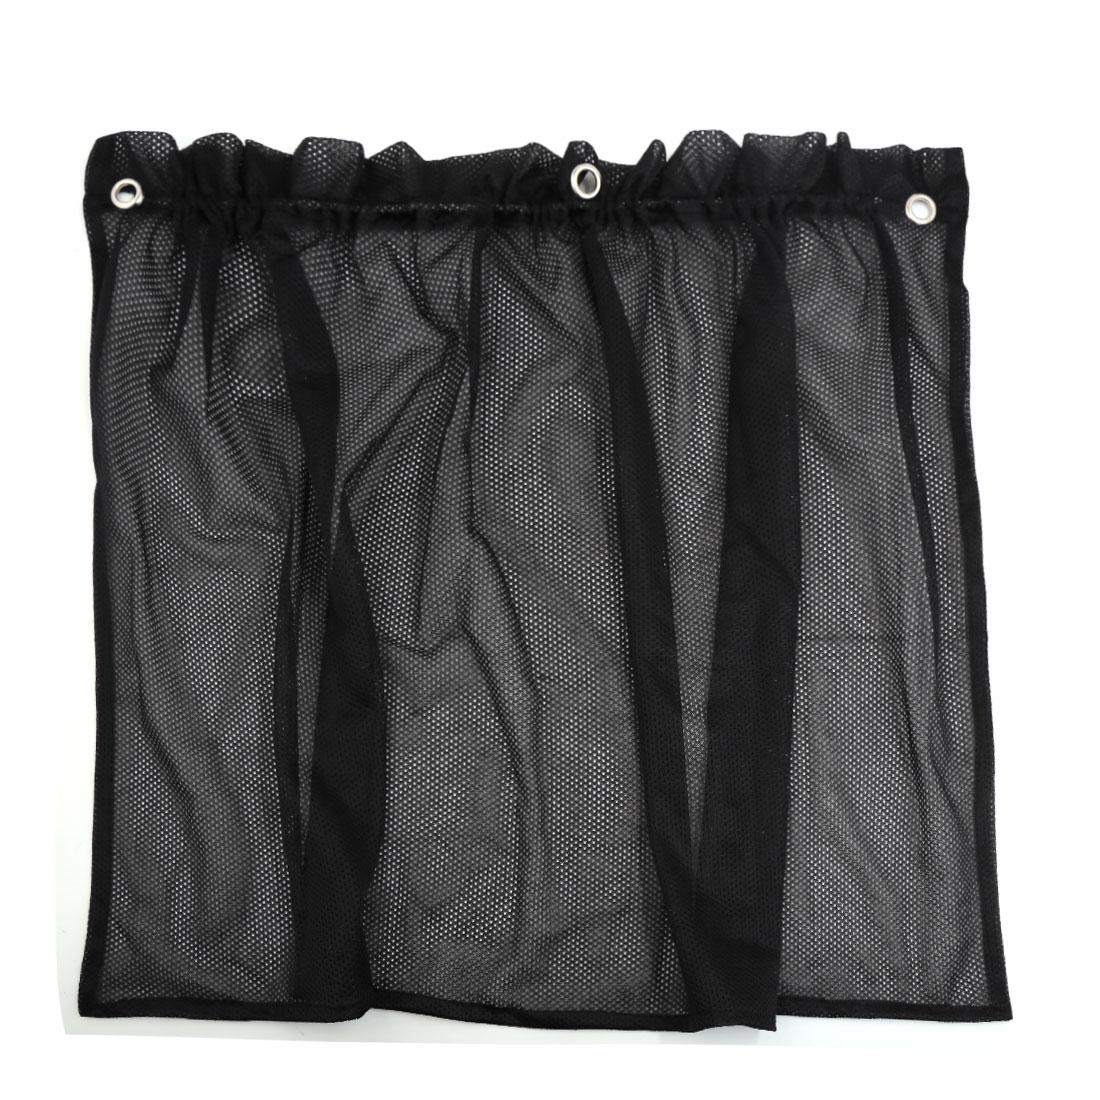 71cm x 43cm Car Sun Shade Side Window Nylon Mesh Curtain Foldable Sunshade UV Protection Black